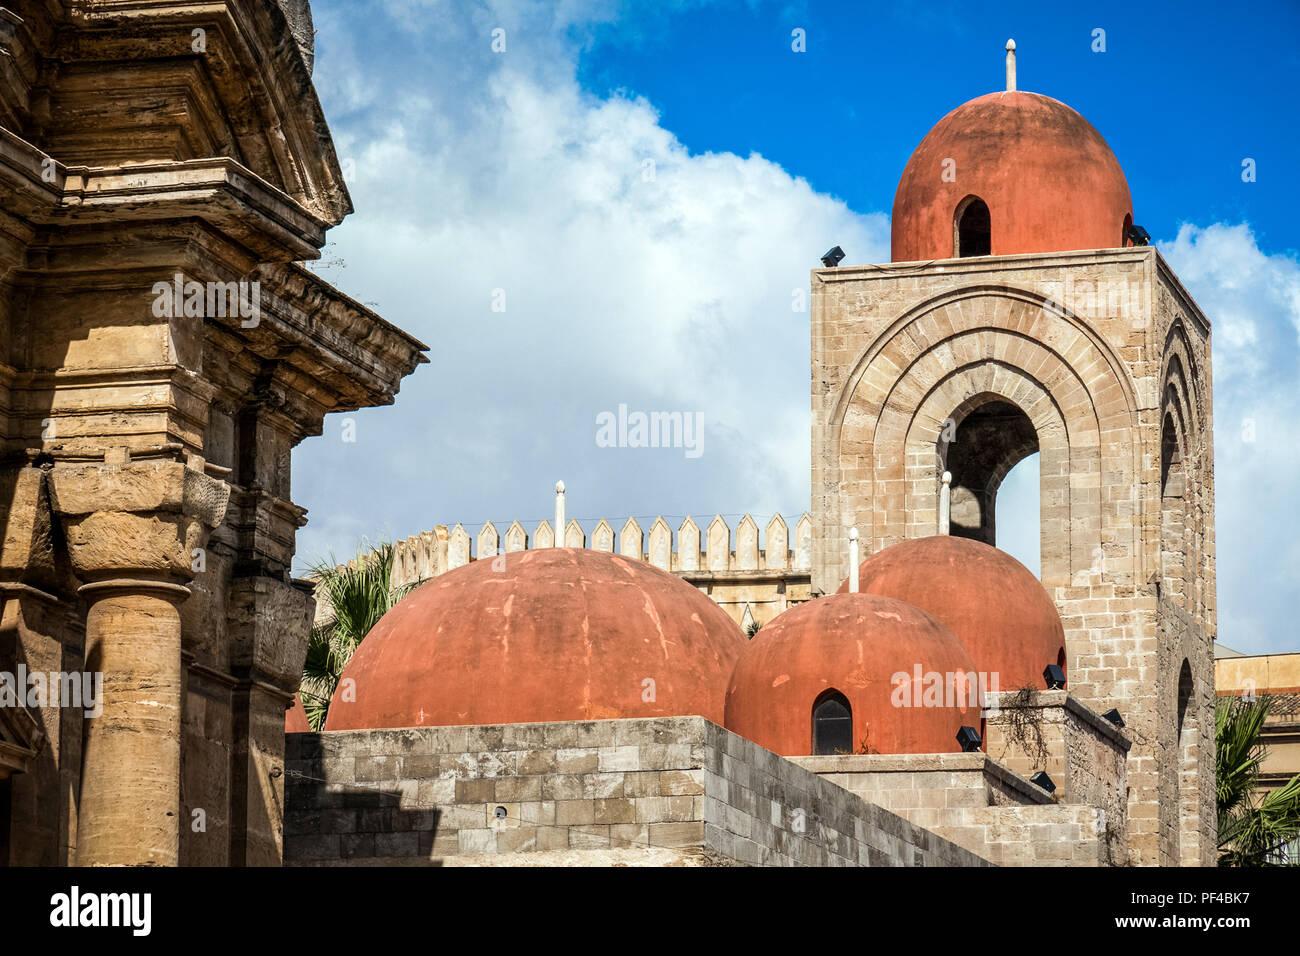 Italy, Sicily, Palermo, San Giovanni degli Eremiti exterior - Stock Image